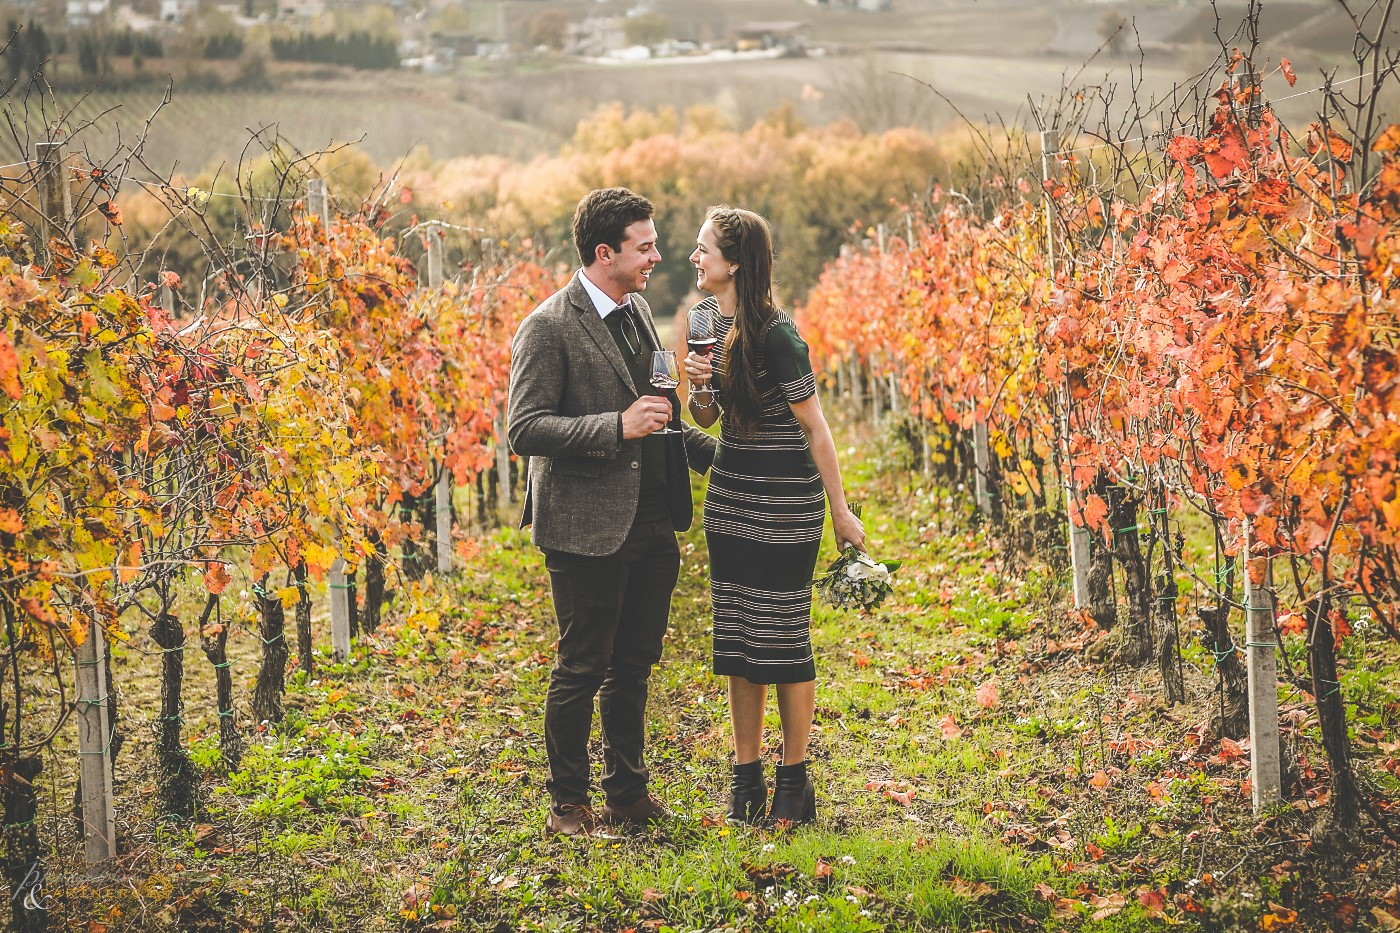 🍃 In the vineyard of Montefalco 🍃